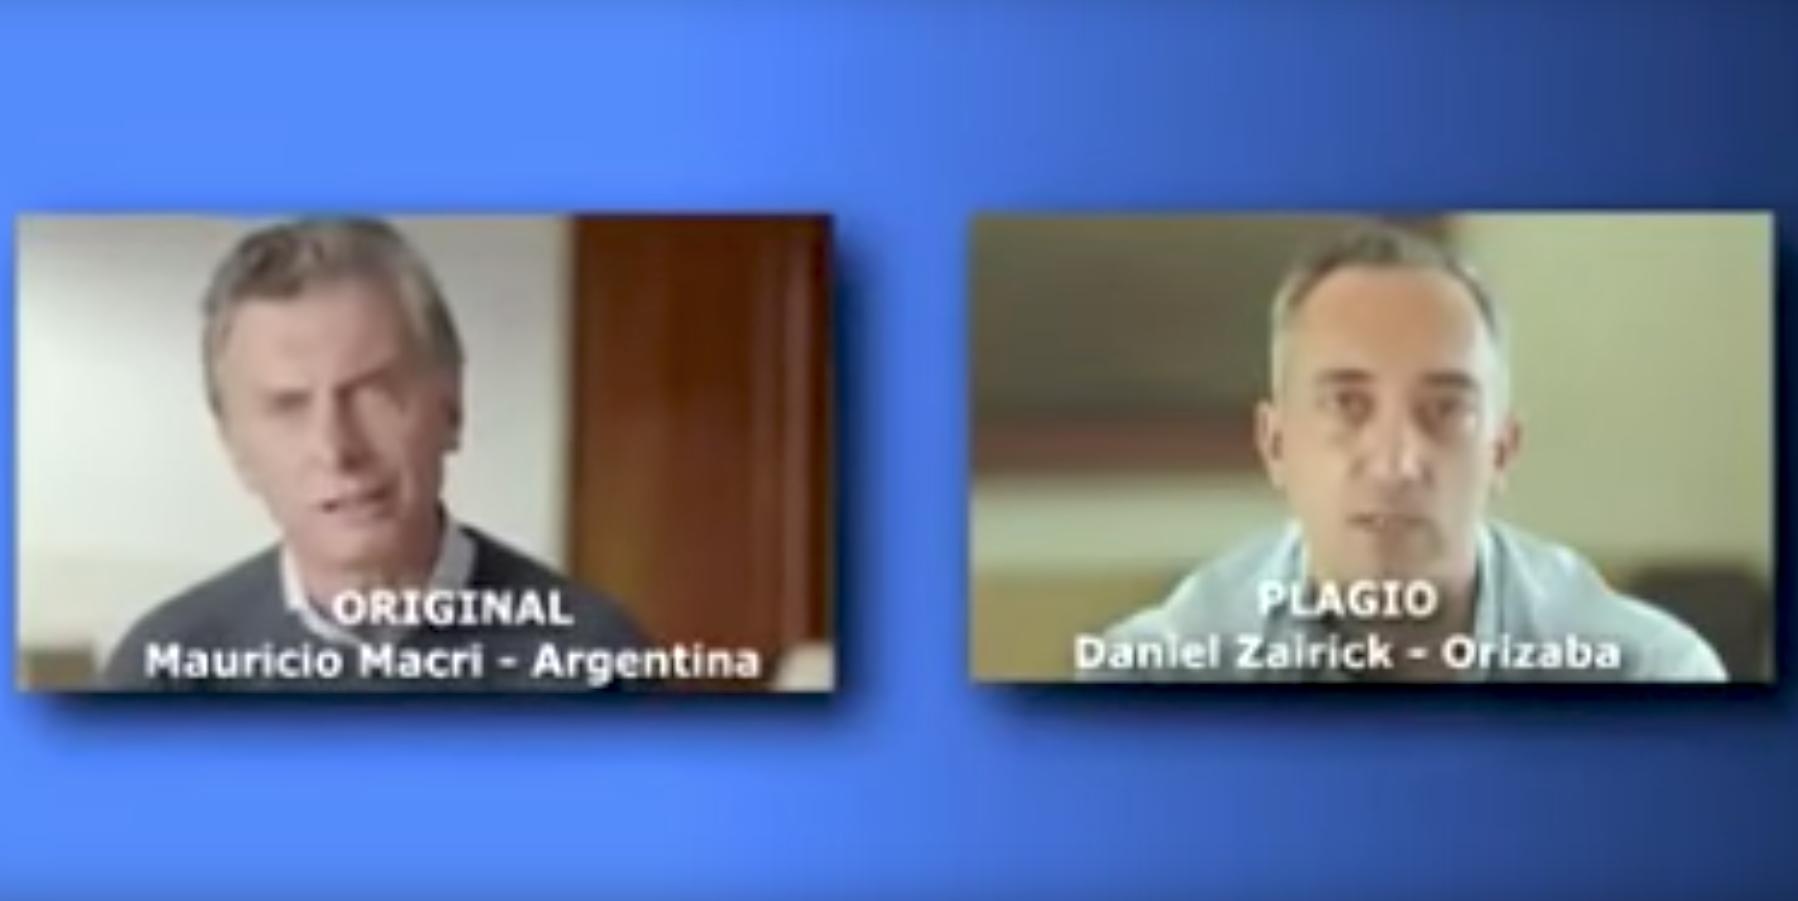 VIDEO: Plagia candidato de Veracruz spot de campaña de presidente argentino